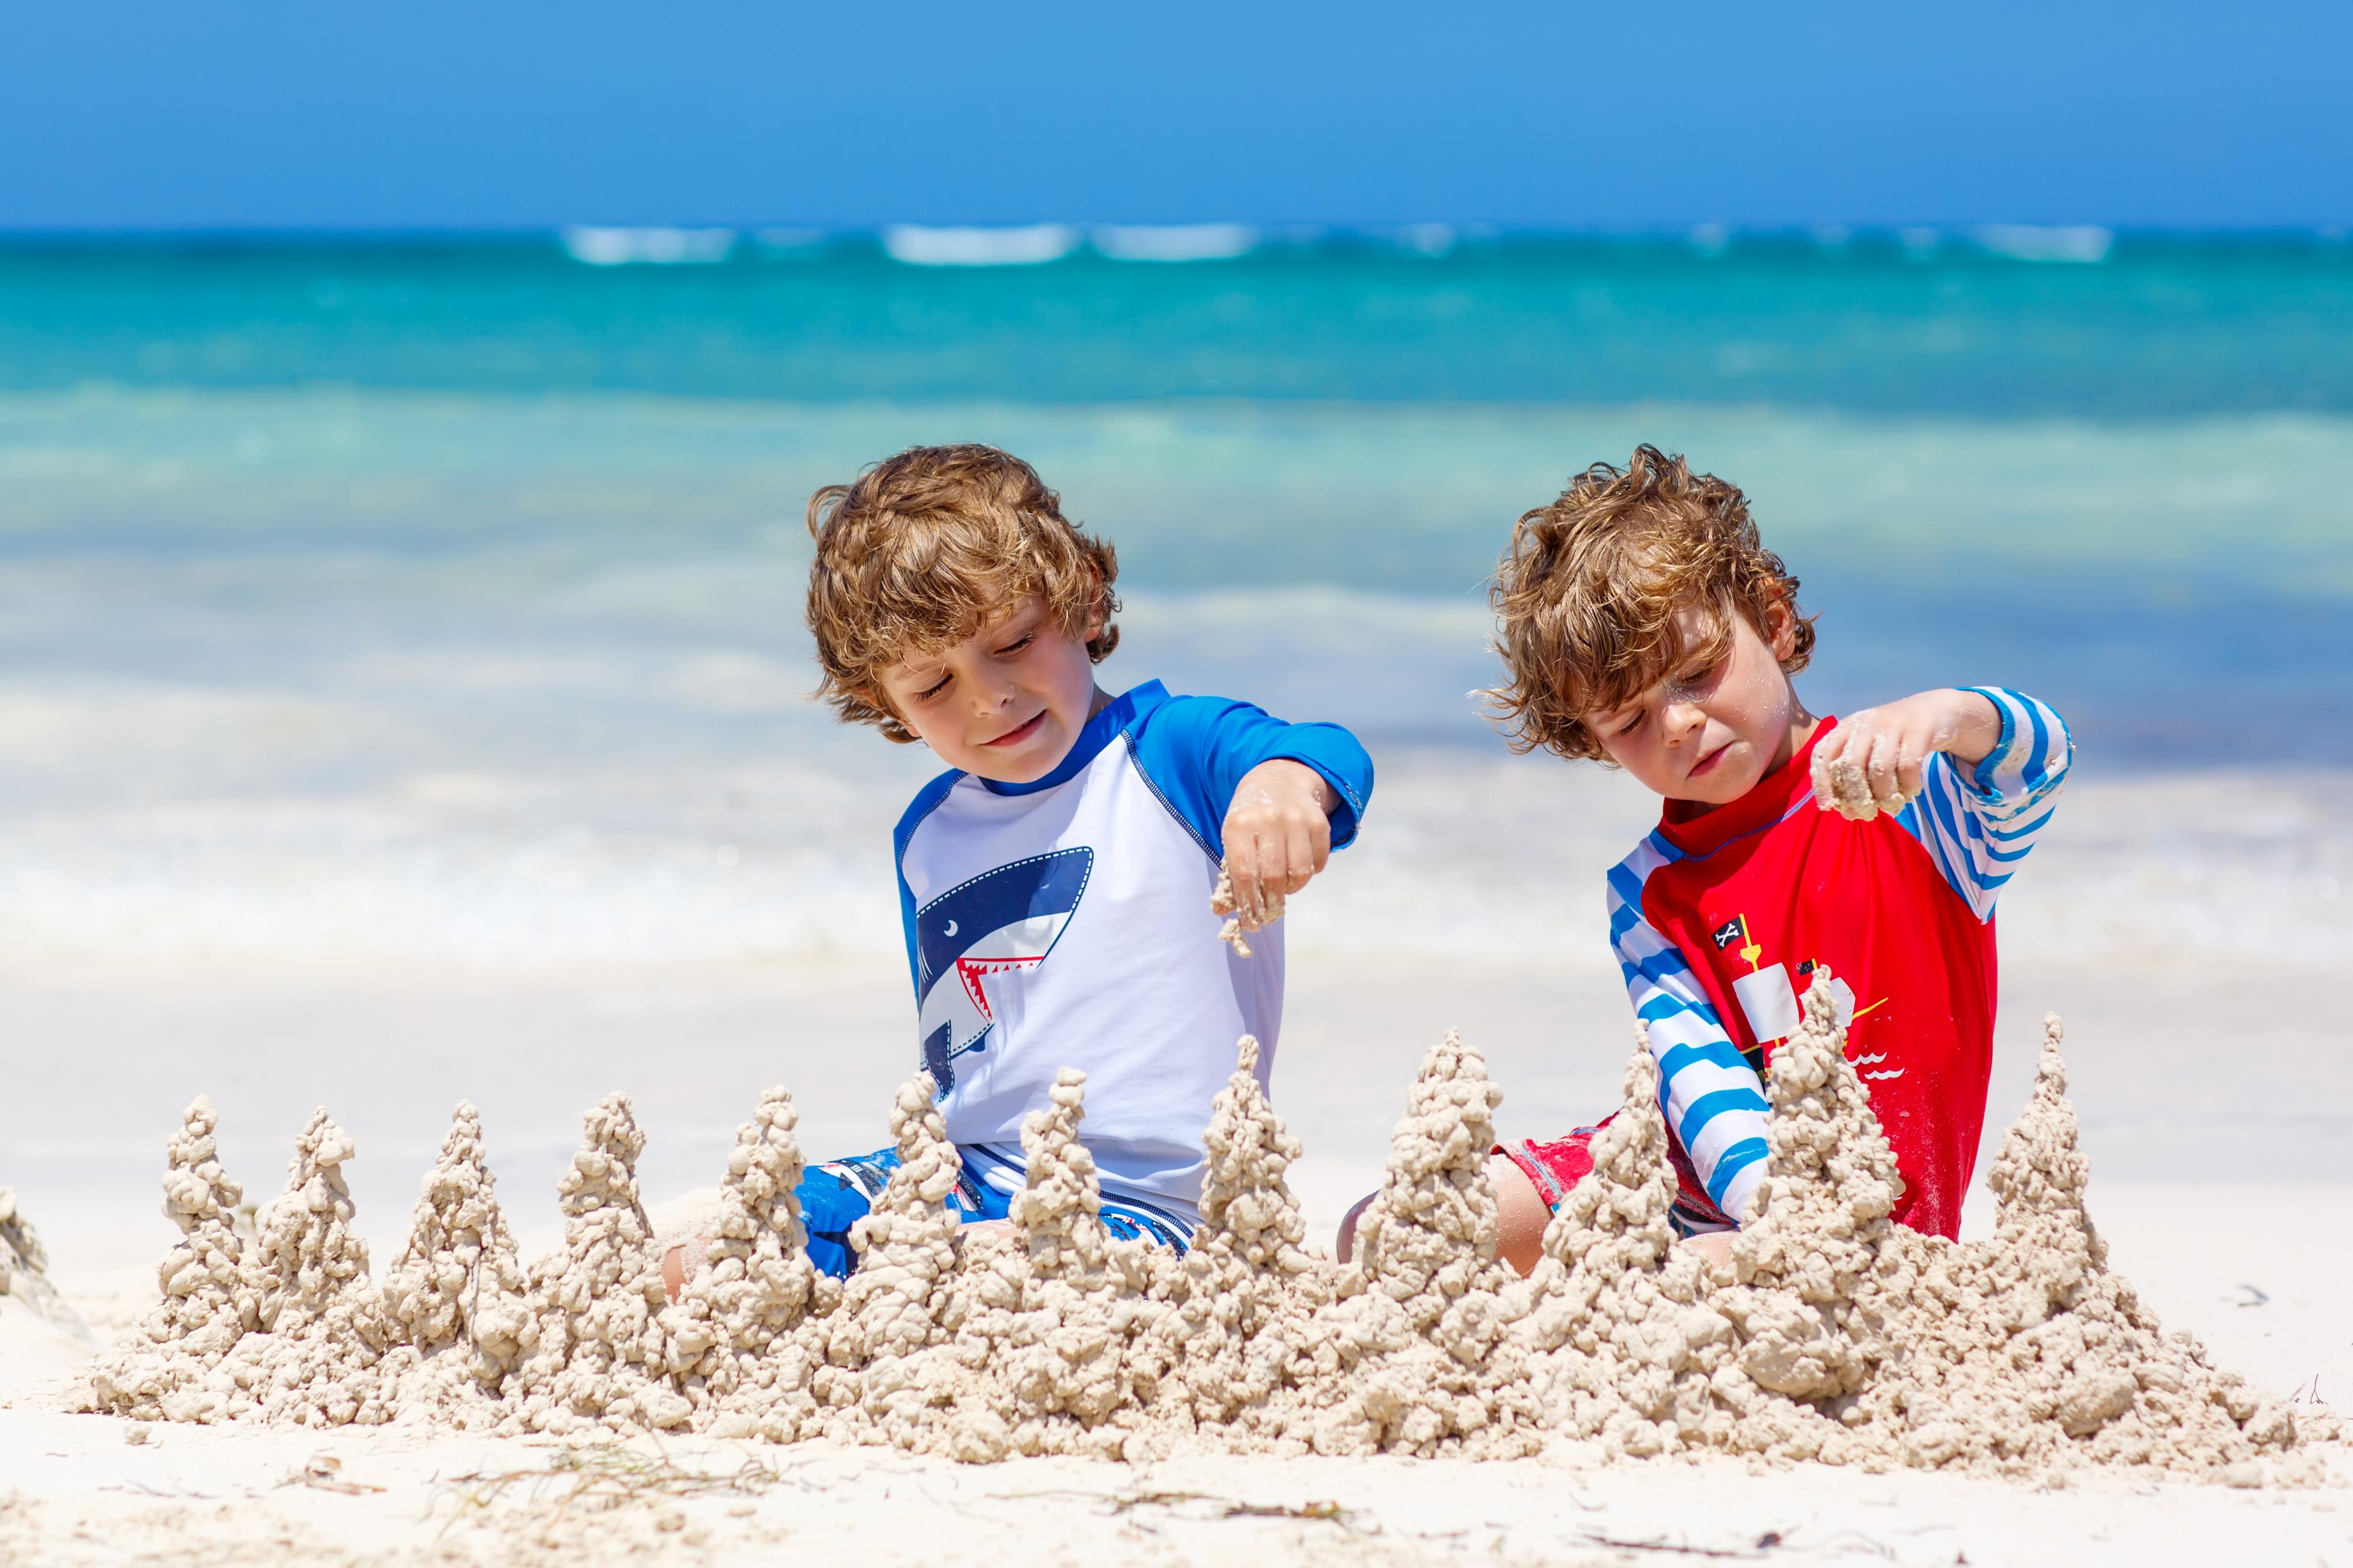 Kids Brothers Baby - Free photo on Pixabay